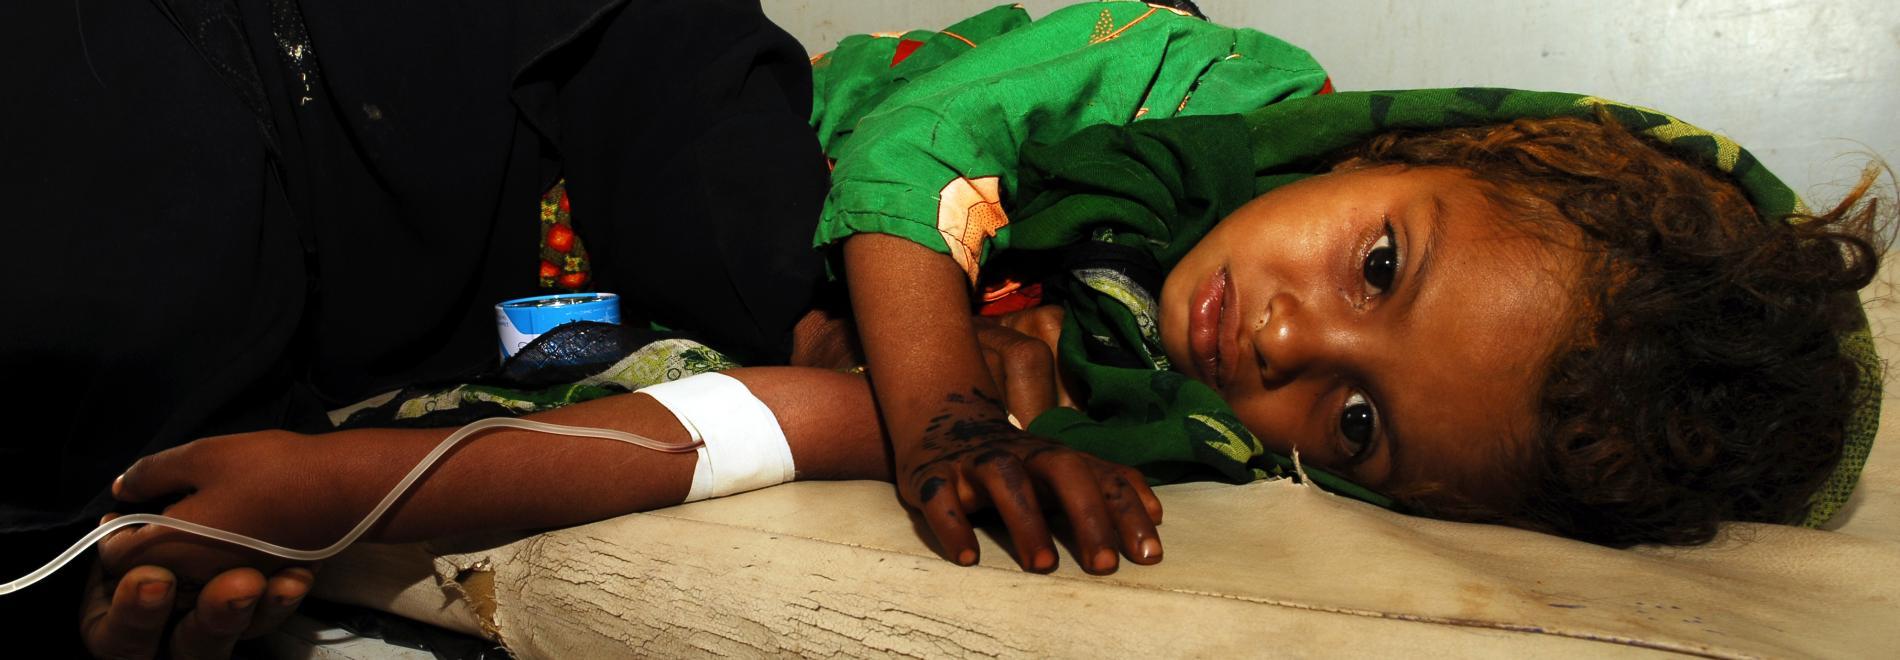 Vor allem Kinder sind im Jemen von der Cholera bedroht. Foto: Jean Baptiste Lopez